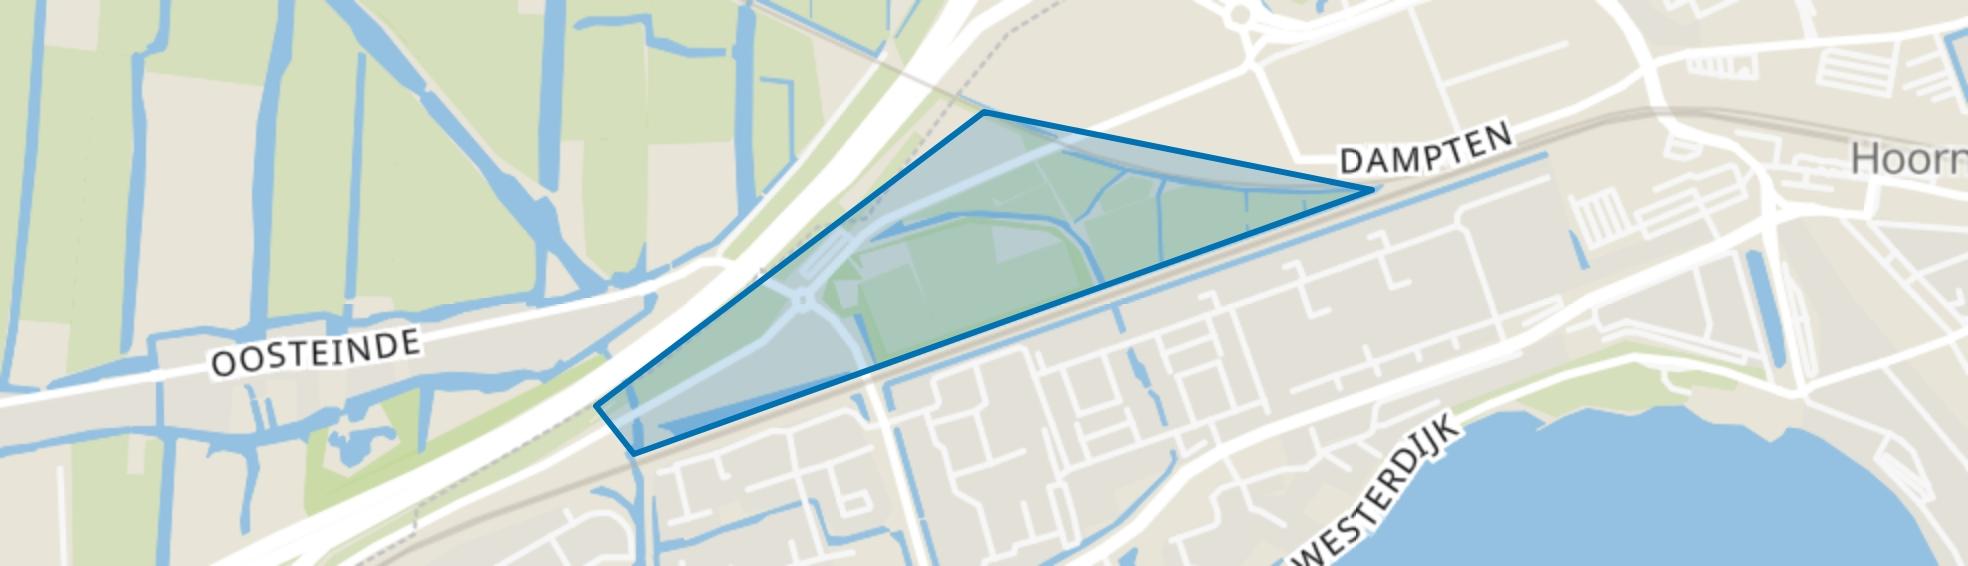 Grote Waal - Buurt 13 02, Hoorn (NH) map